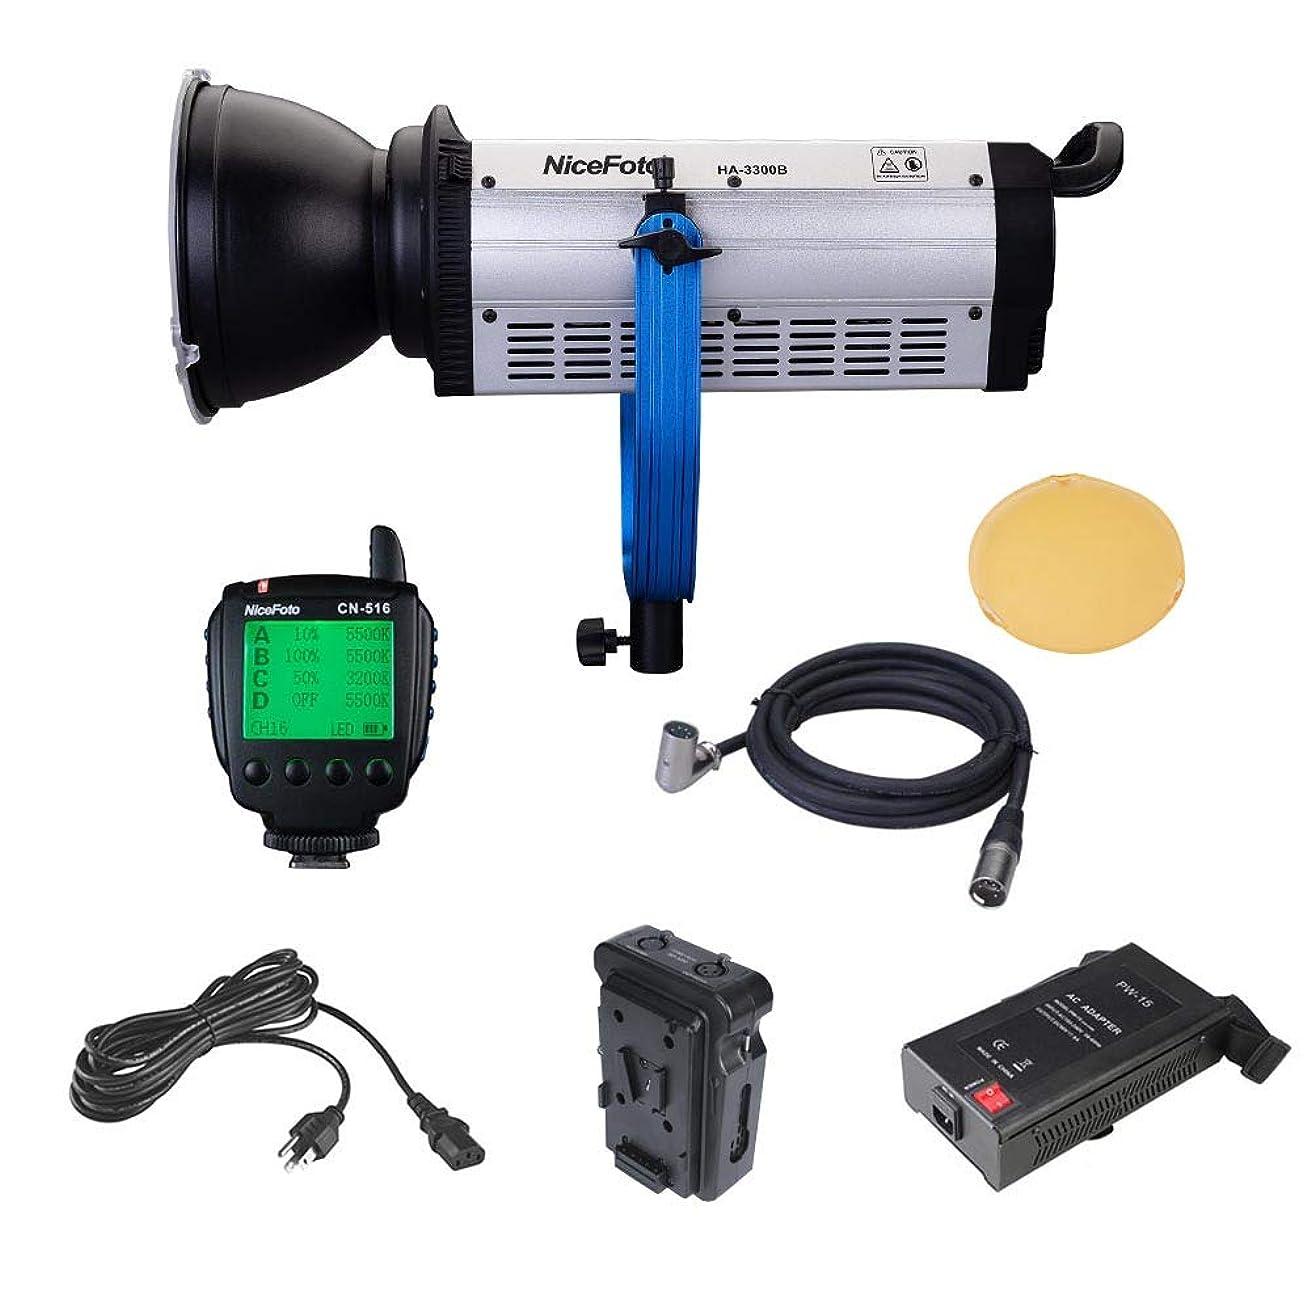 Andoer NiceFoto HA-3300B 330W Professional 5500K Daylight COB LED Video Light Film Light Photographic Equipment Studio Lighting CRI 97+ 36000LM Support APP & 2.4G Remote Control